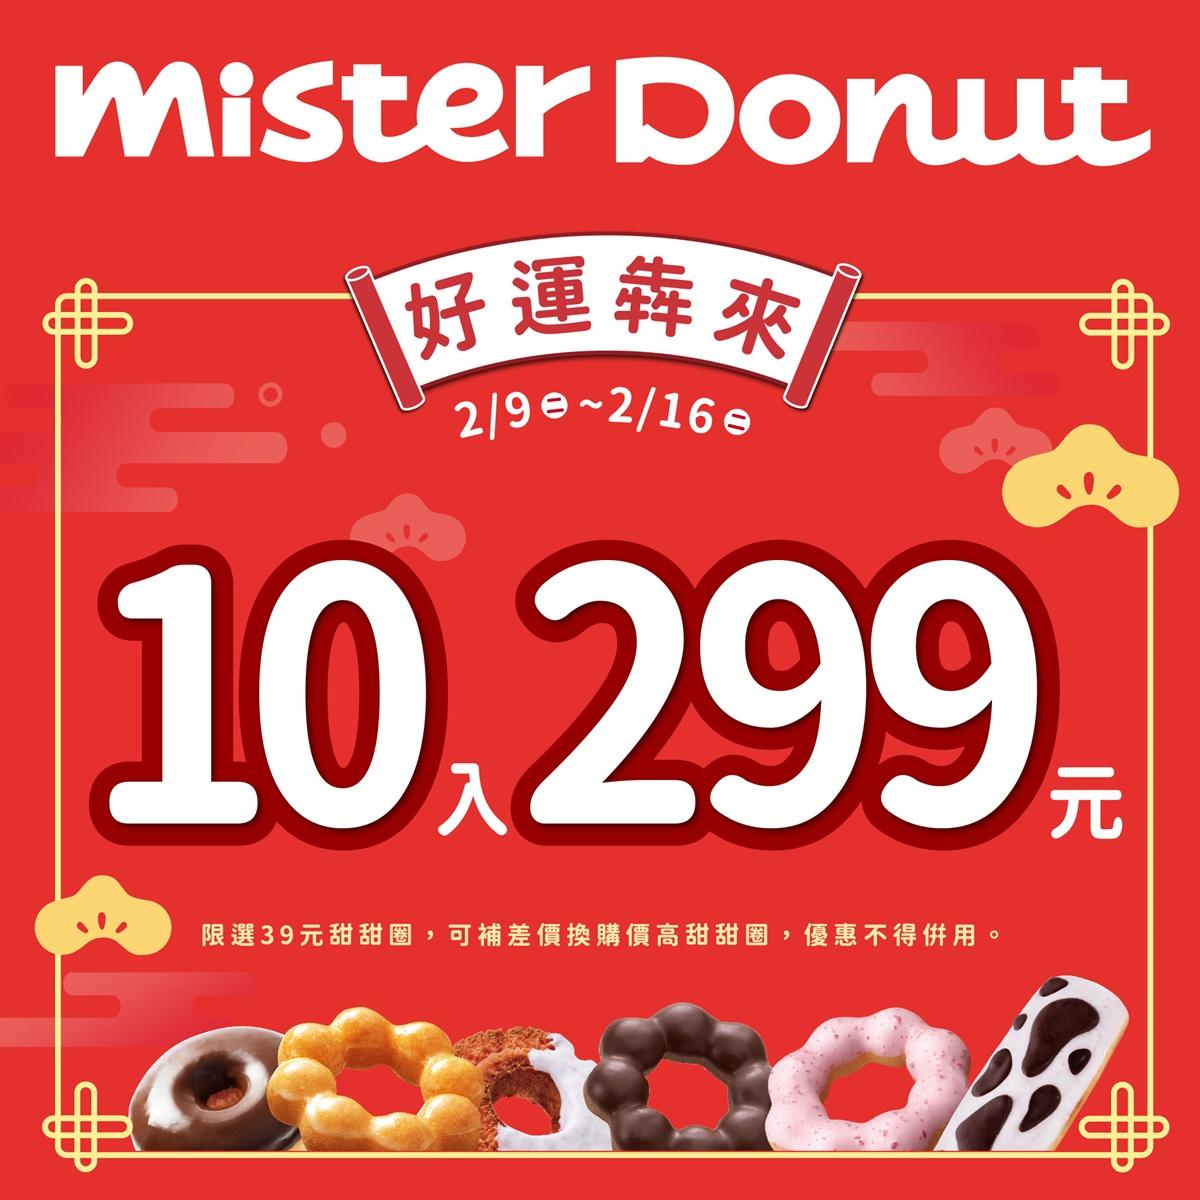 P助、兔兔手捧甜甜圈太萌!Mister Donut推「10入299元」新春優惠,限量「卡娜赫拉面紙套」必收